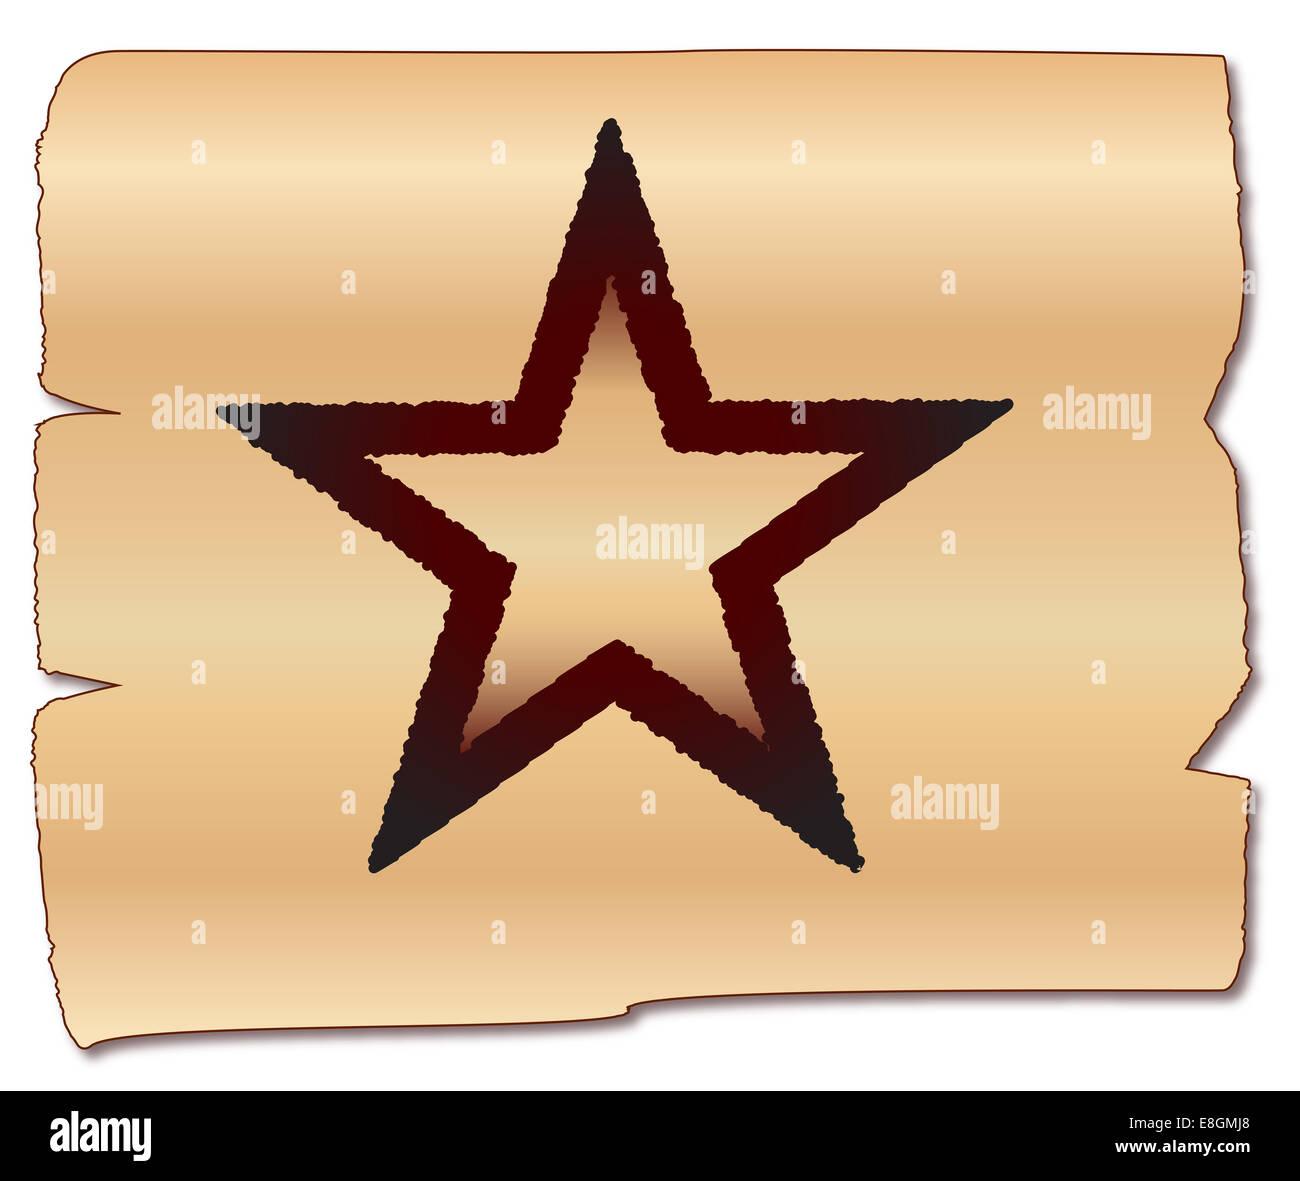 Texas Star Stock Photos & Texas Star Stock Images - Alamy